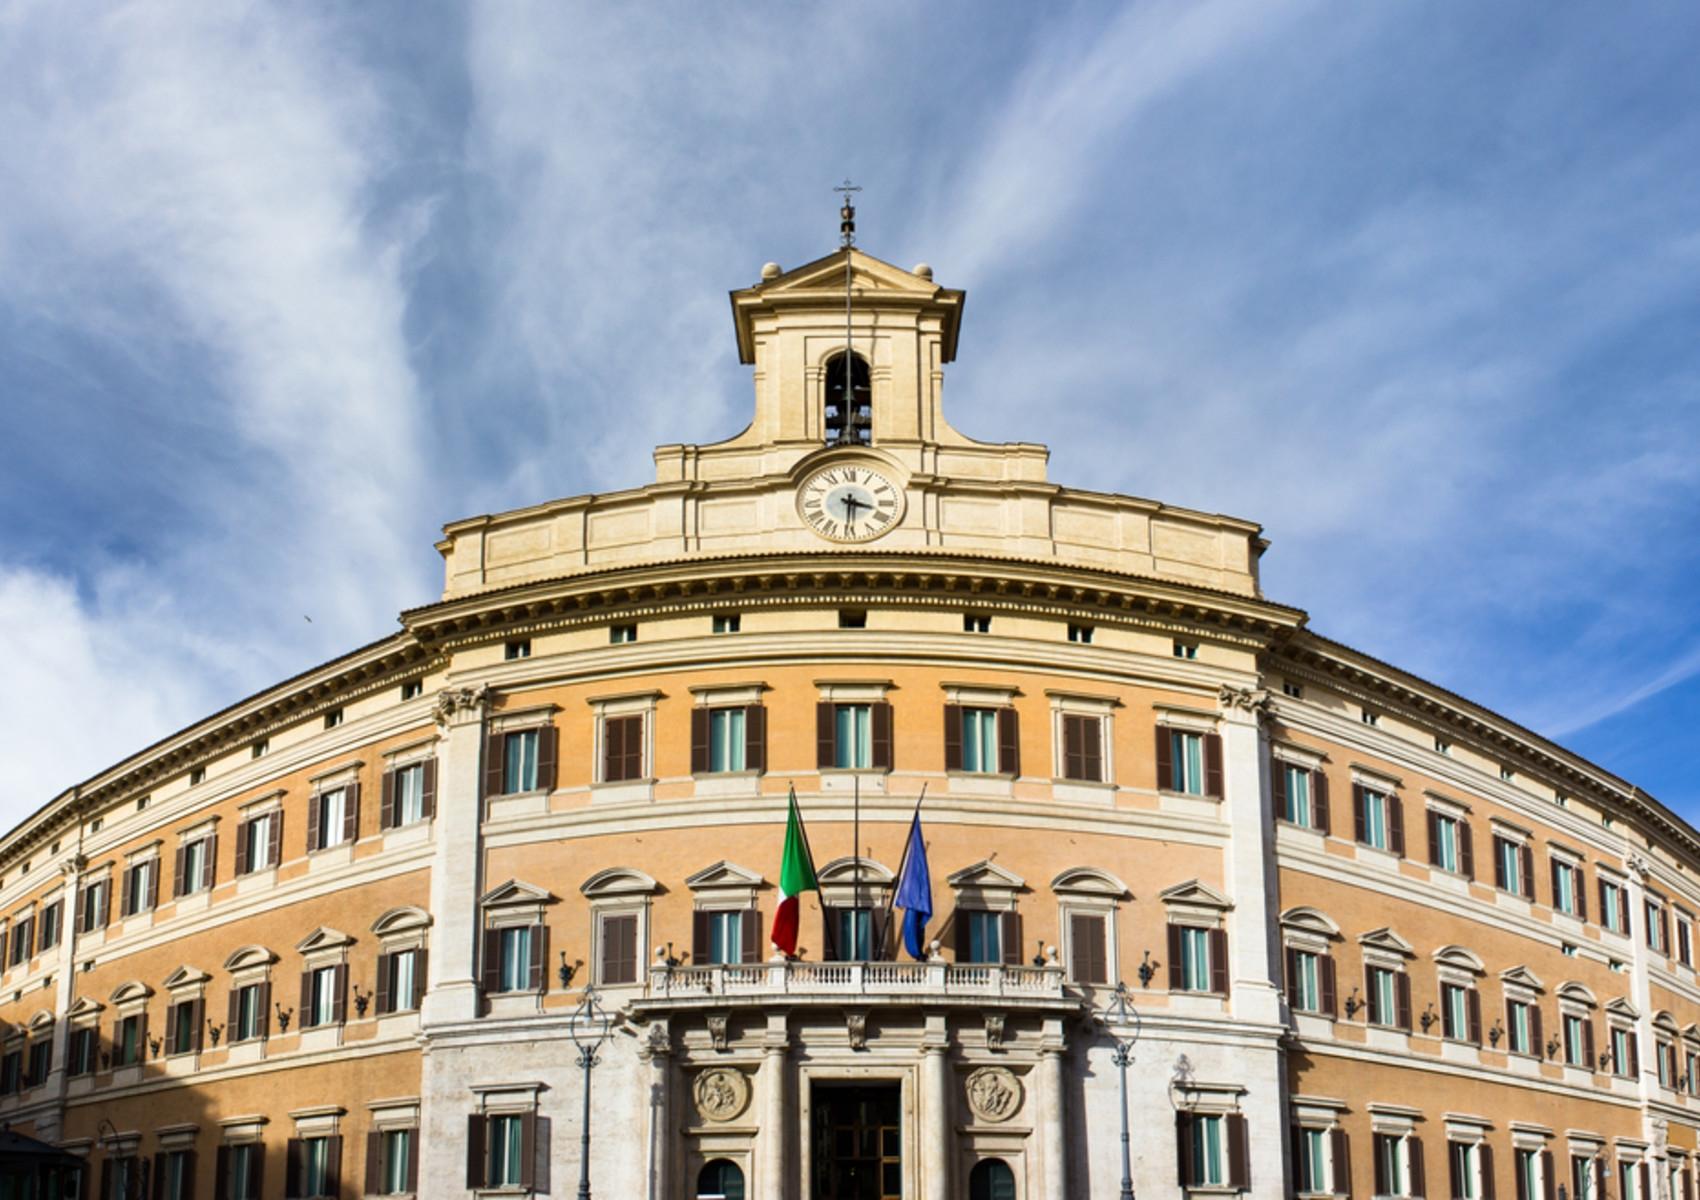 Dal Cura Italia al Decreto Rilancio: i decreti per fronteggiare la pandemia Coronavirus